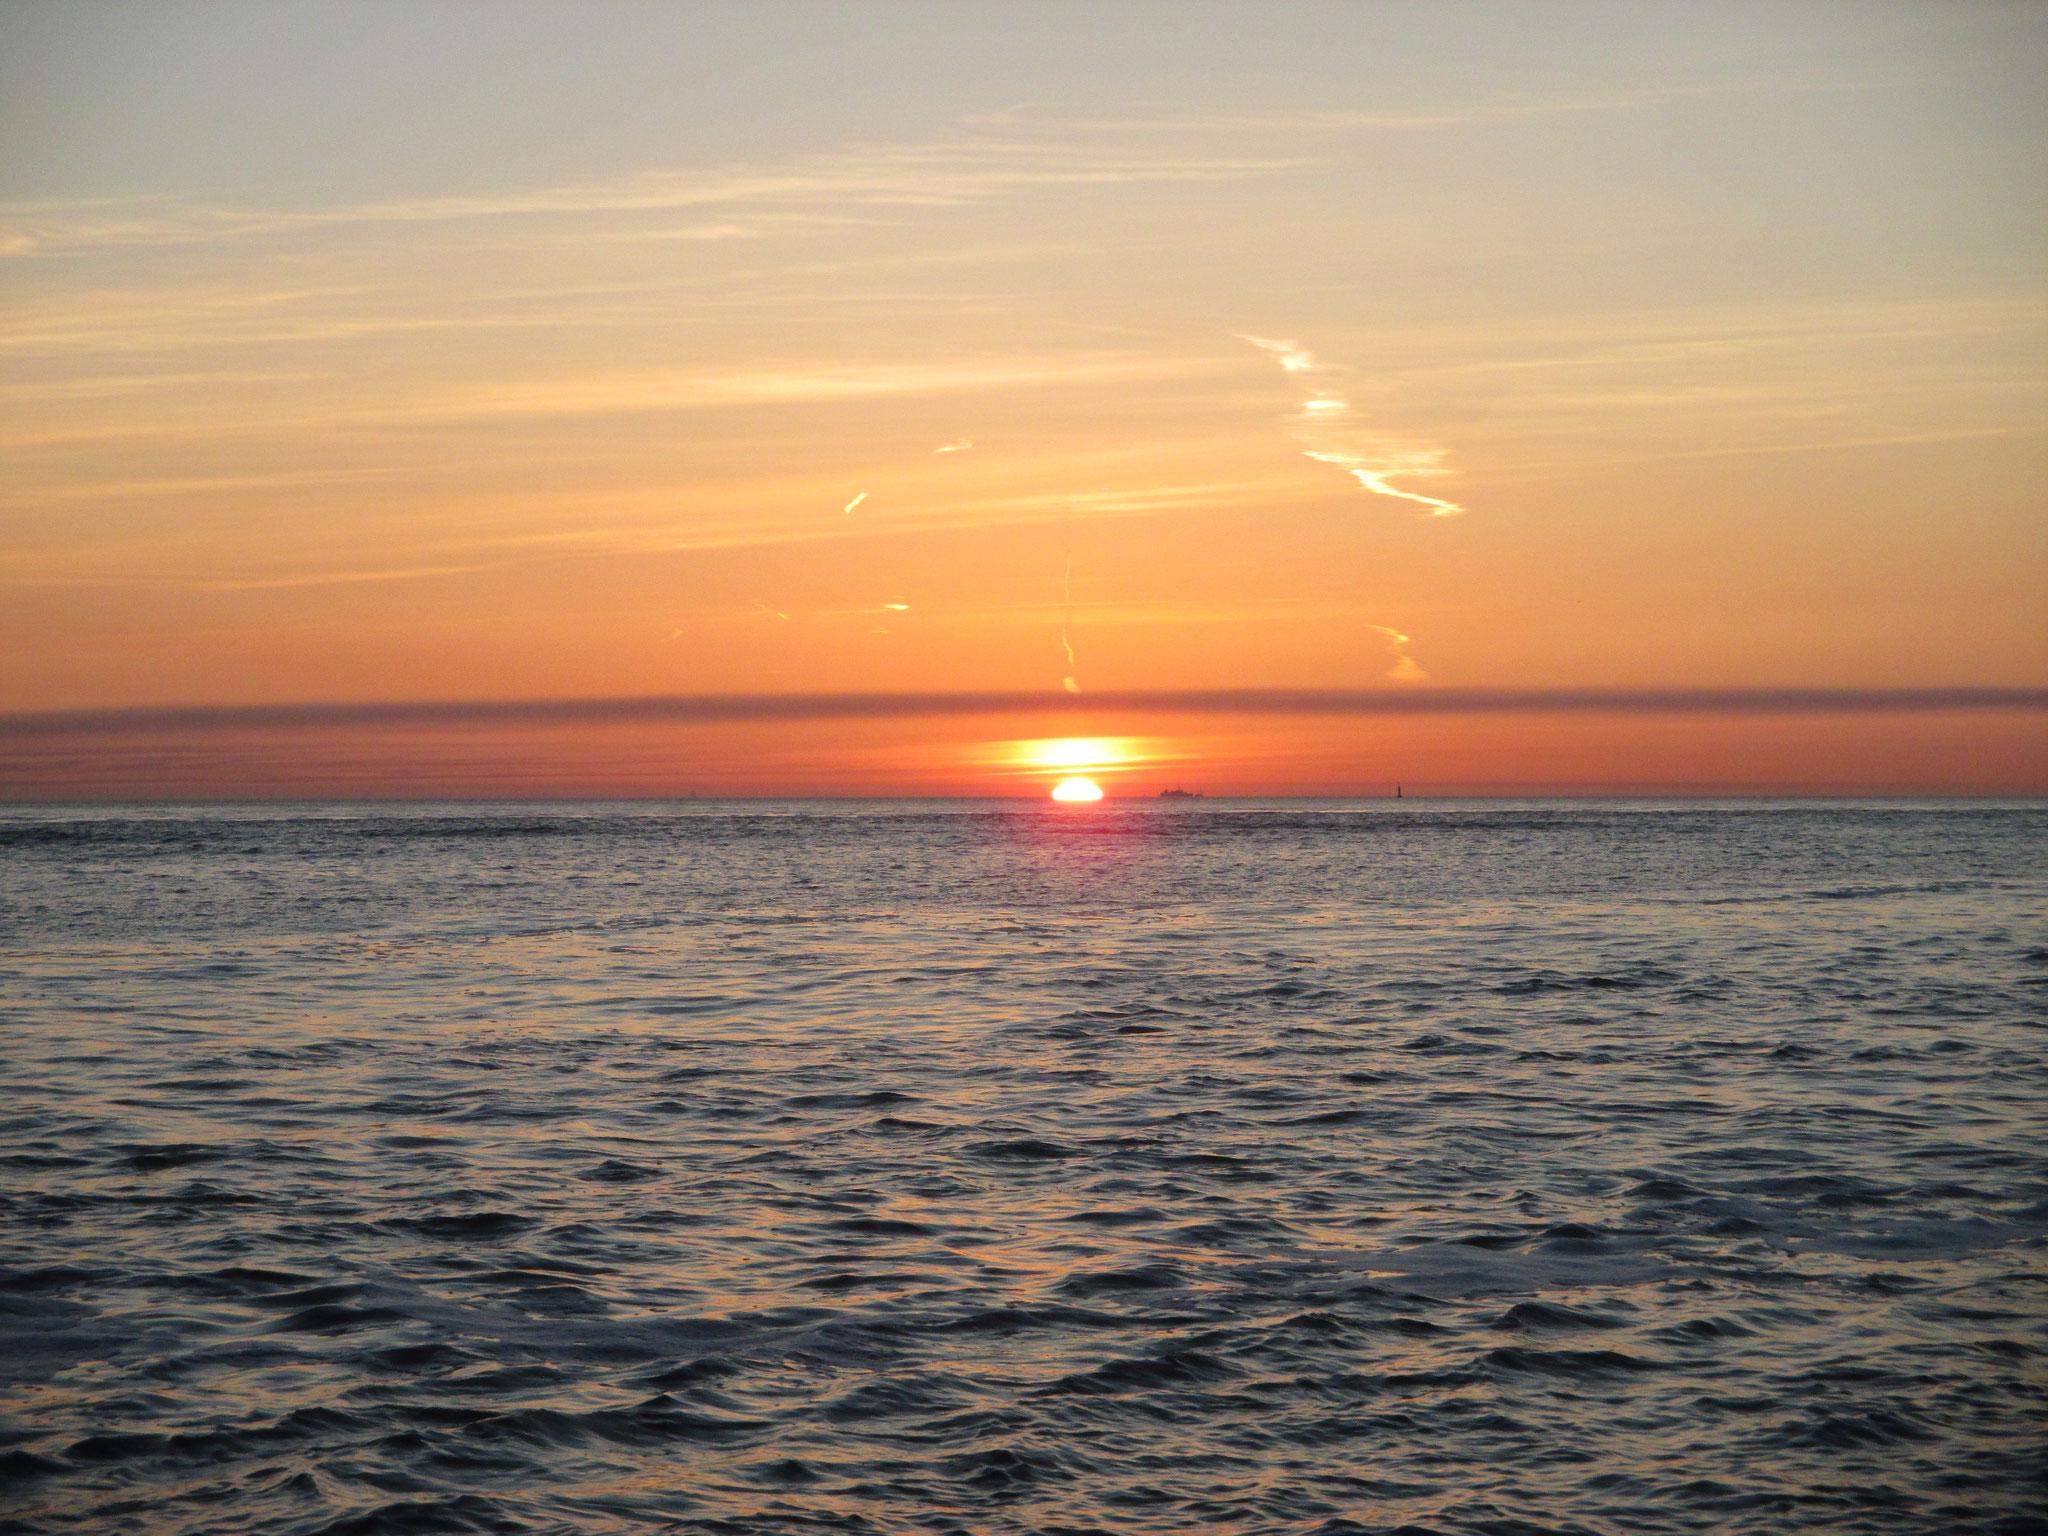 Sonnenaufgang bei Vieland